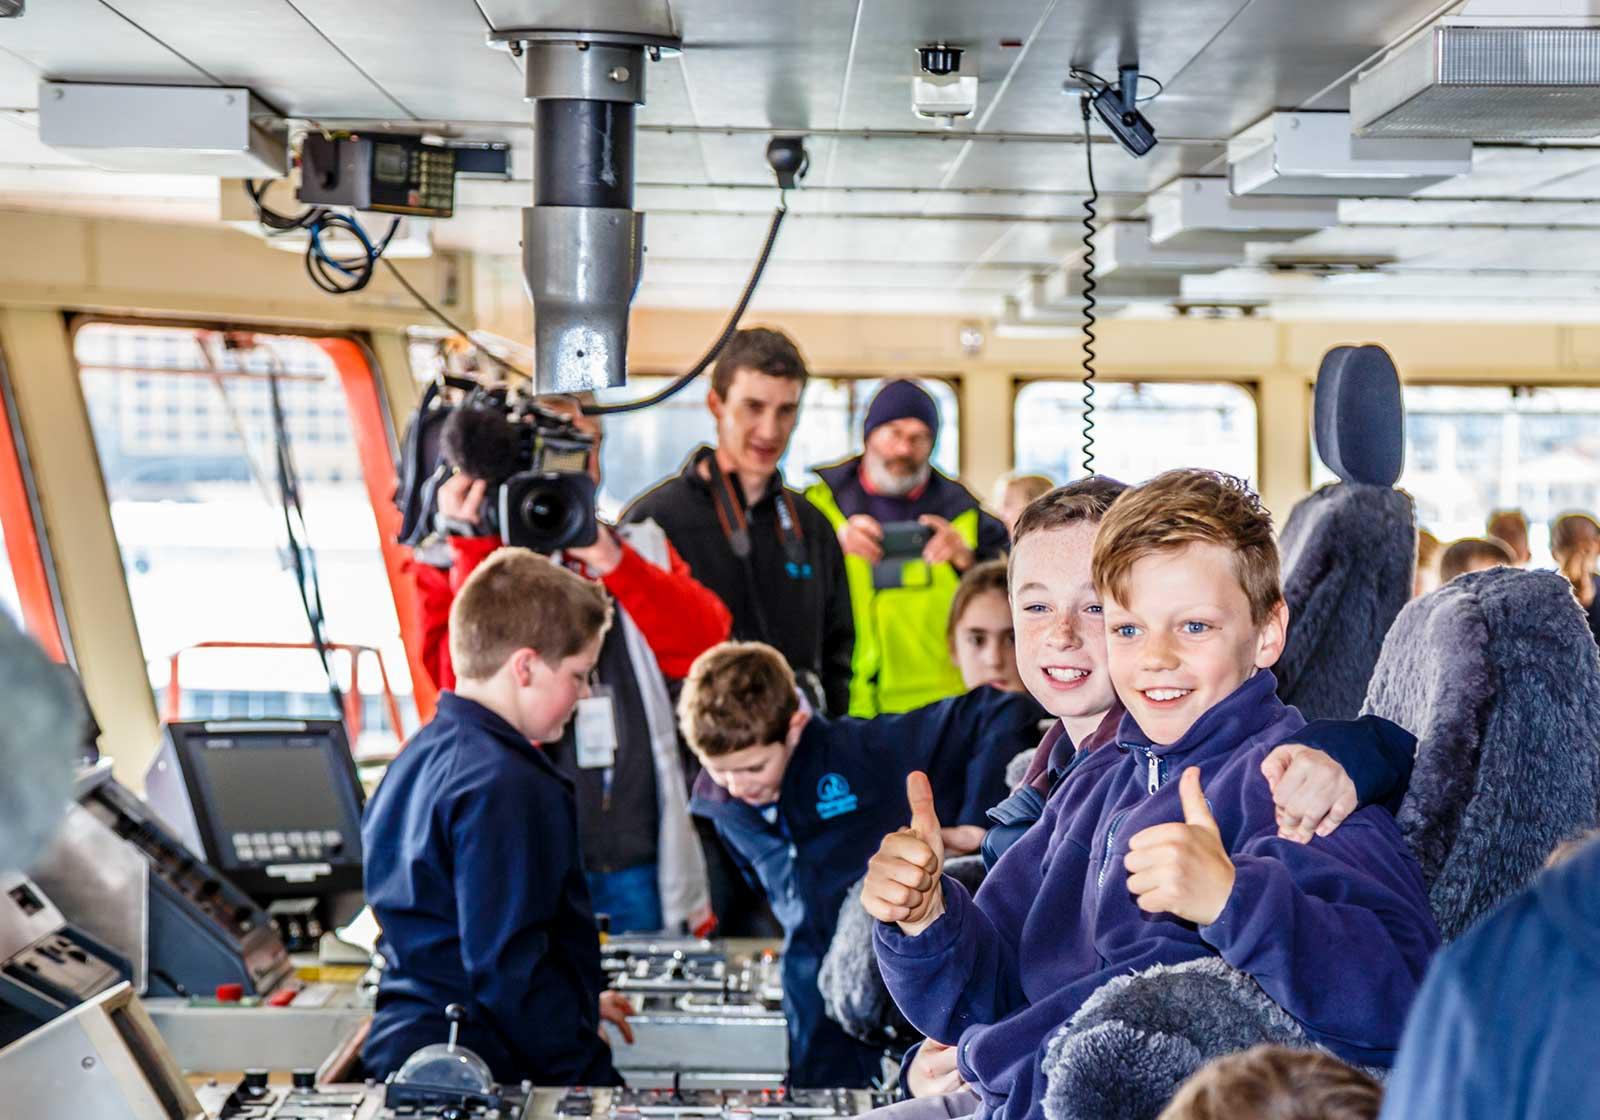 Australian Antarctic Festival, Antarctic Festival, Hobart Festival, Festival Hobart, Mawson's Huts, Mawson's Huts Foundation, Hobart Tourism, School Excursion